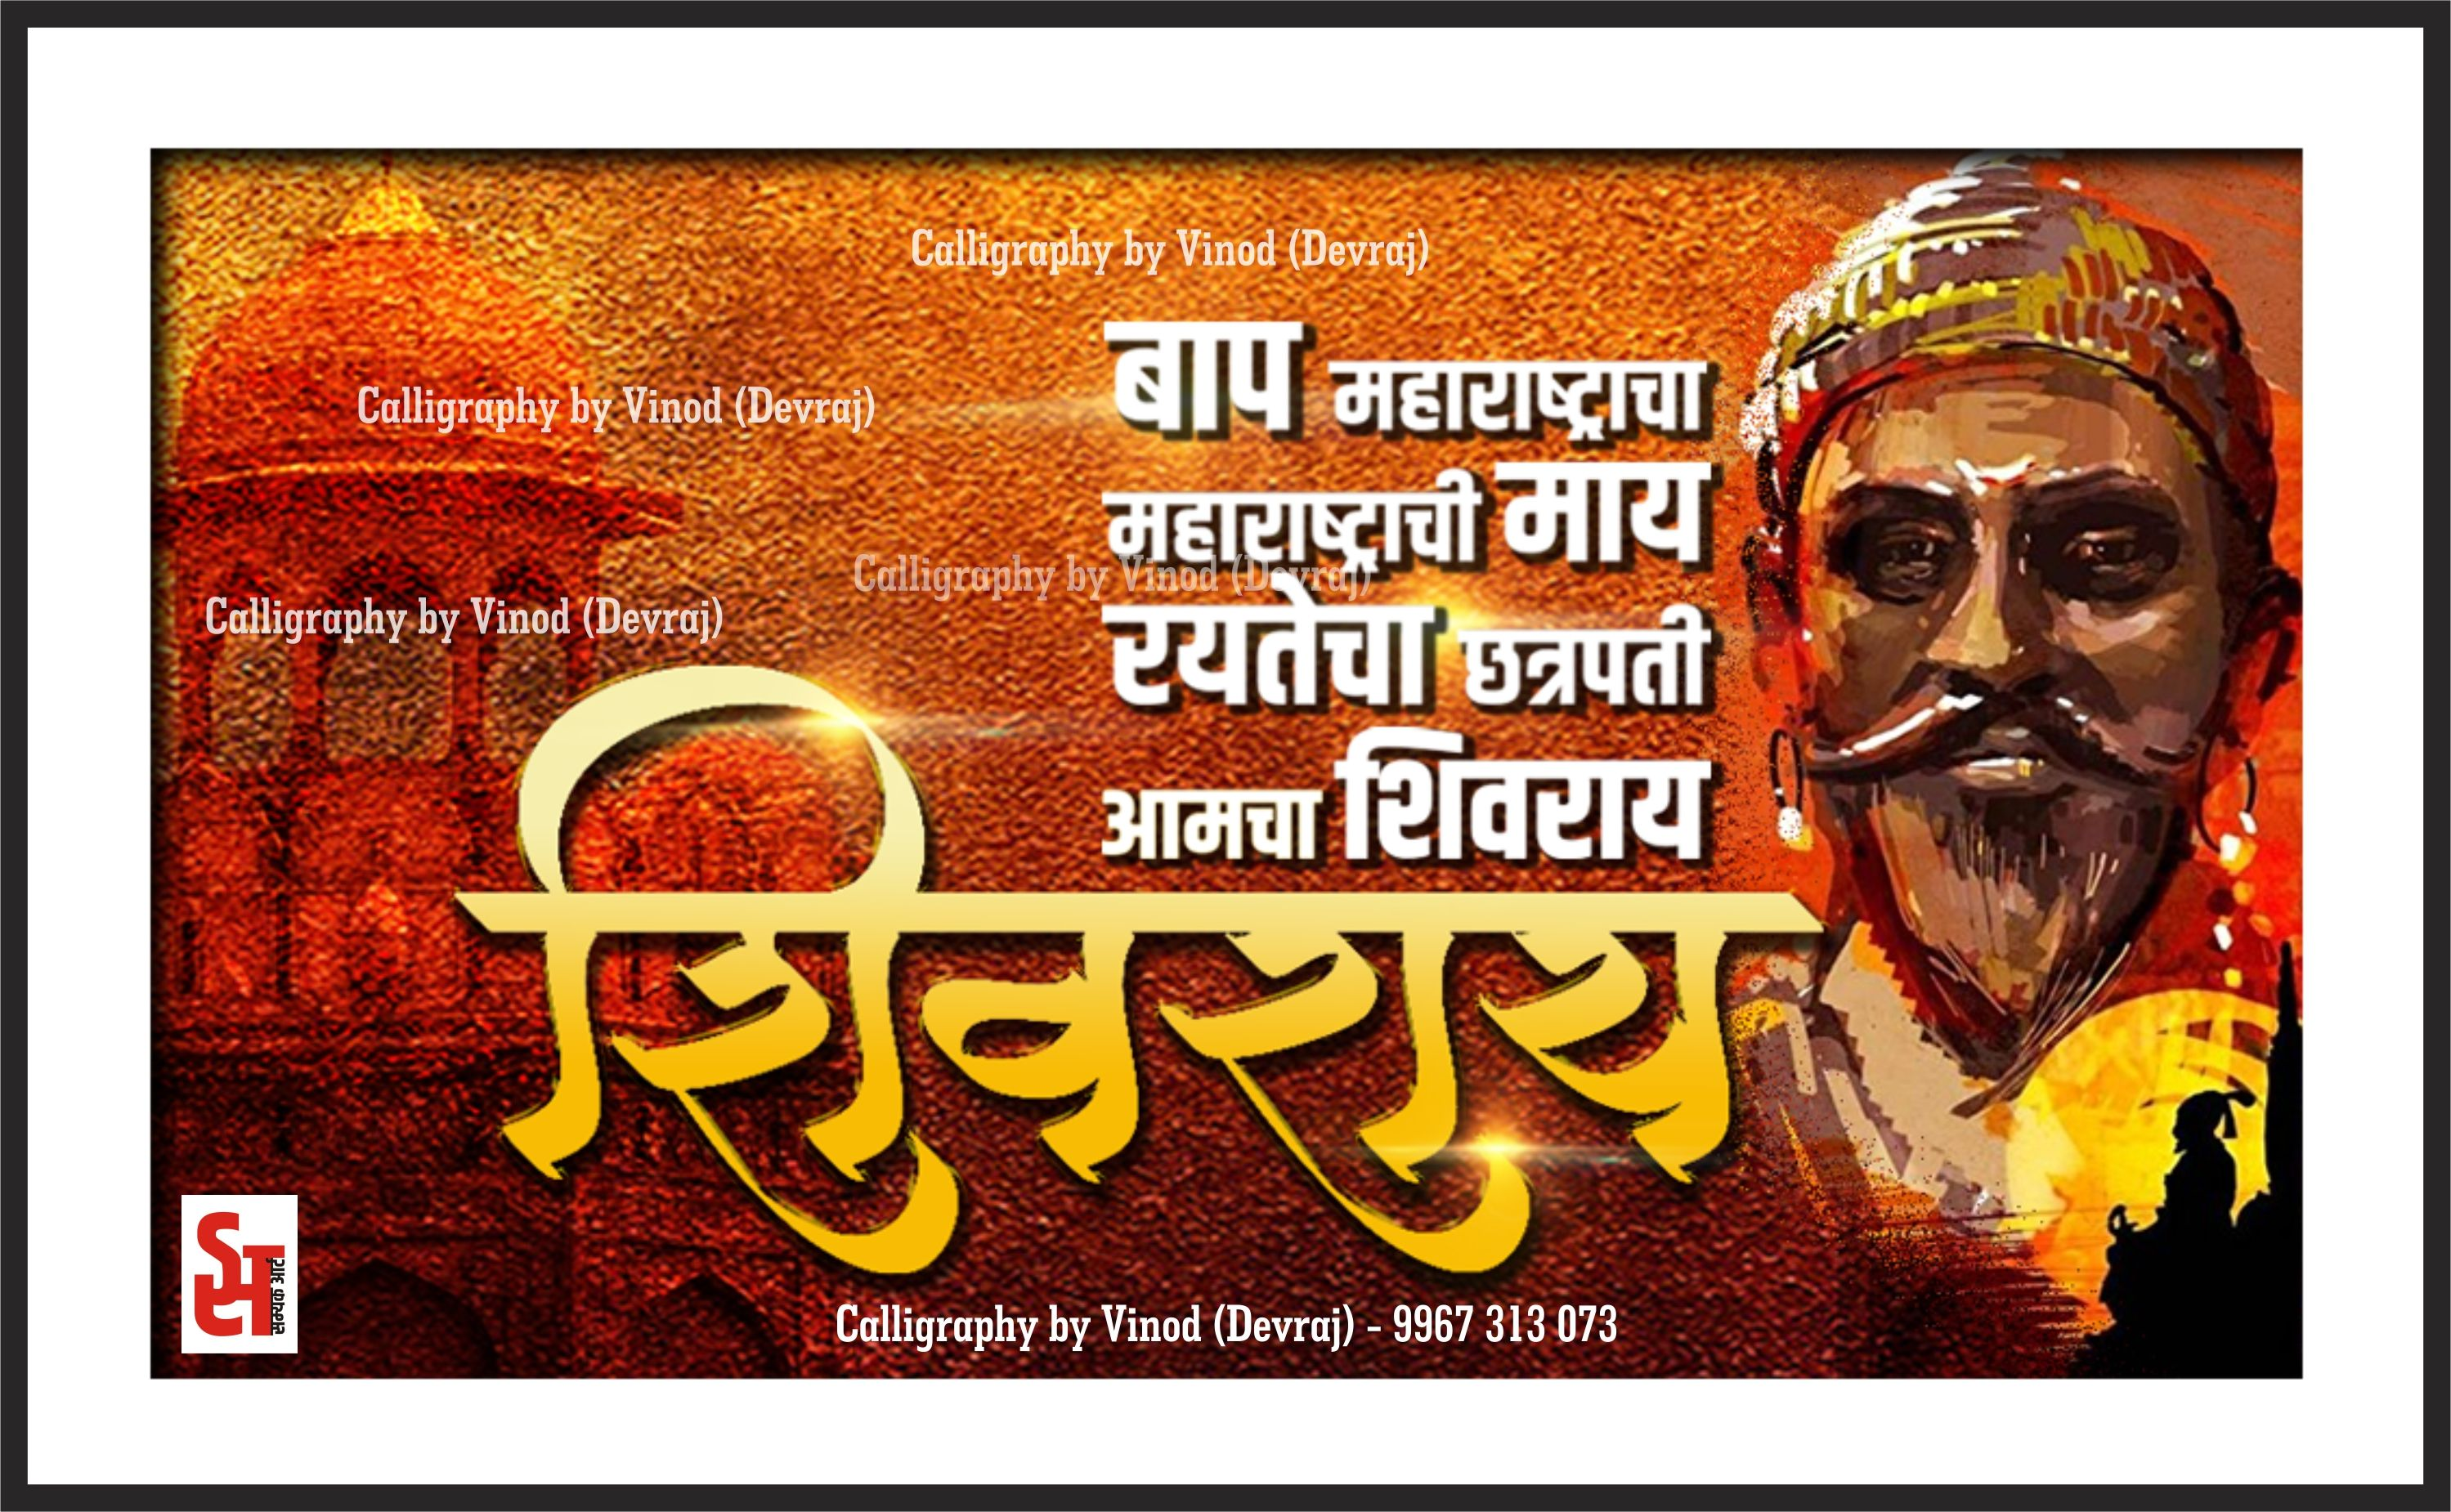 Shivjayanti Shivaji Maharaj Shivray Calligraphy